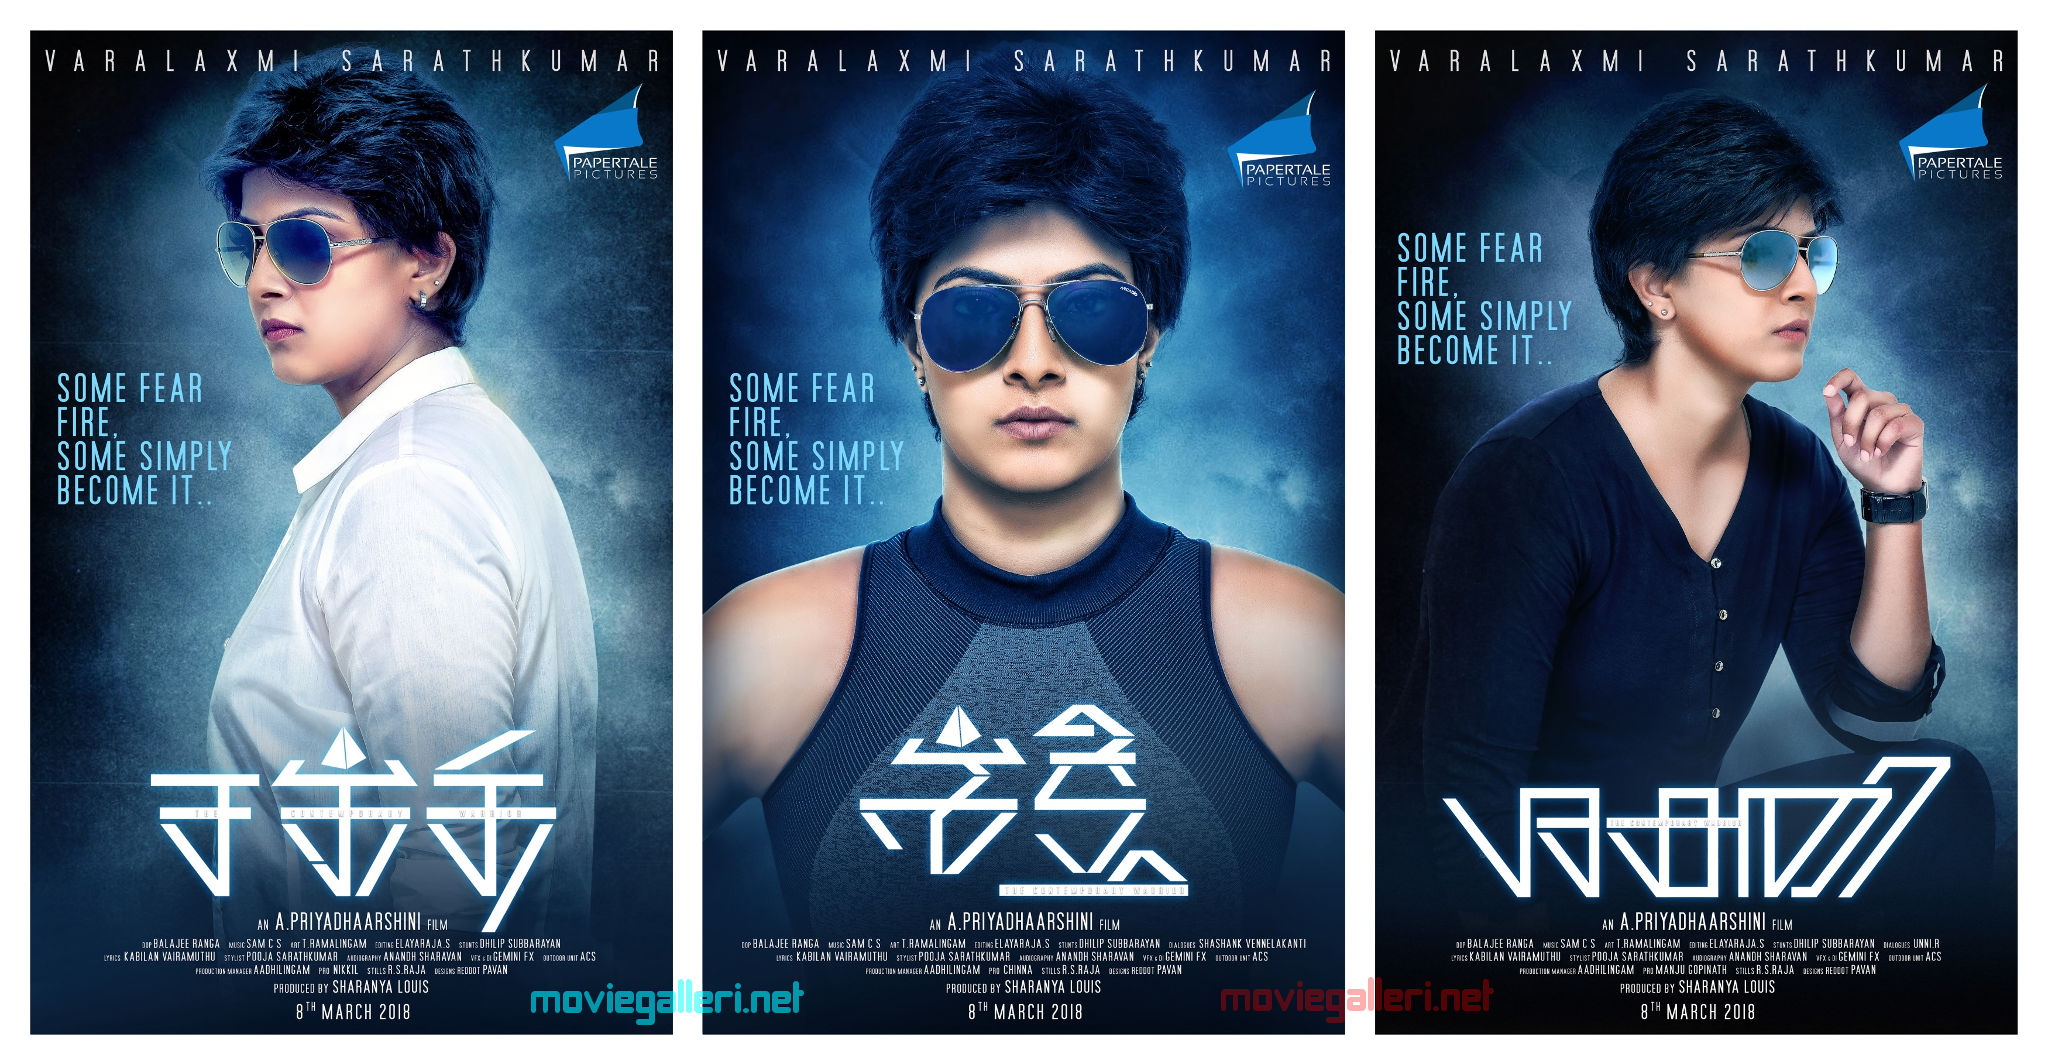 Varalakshmi Sarathkumar Sakthi Movie First Look Posters